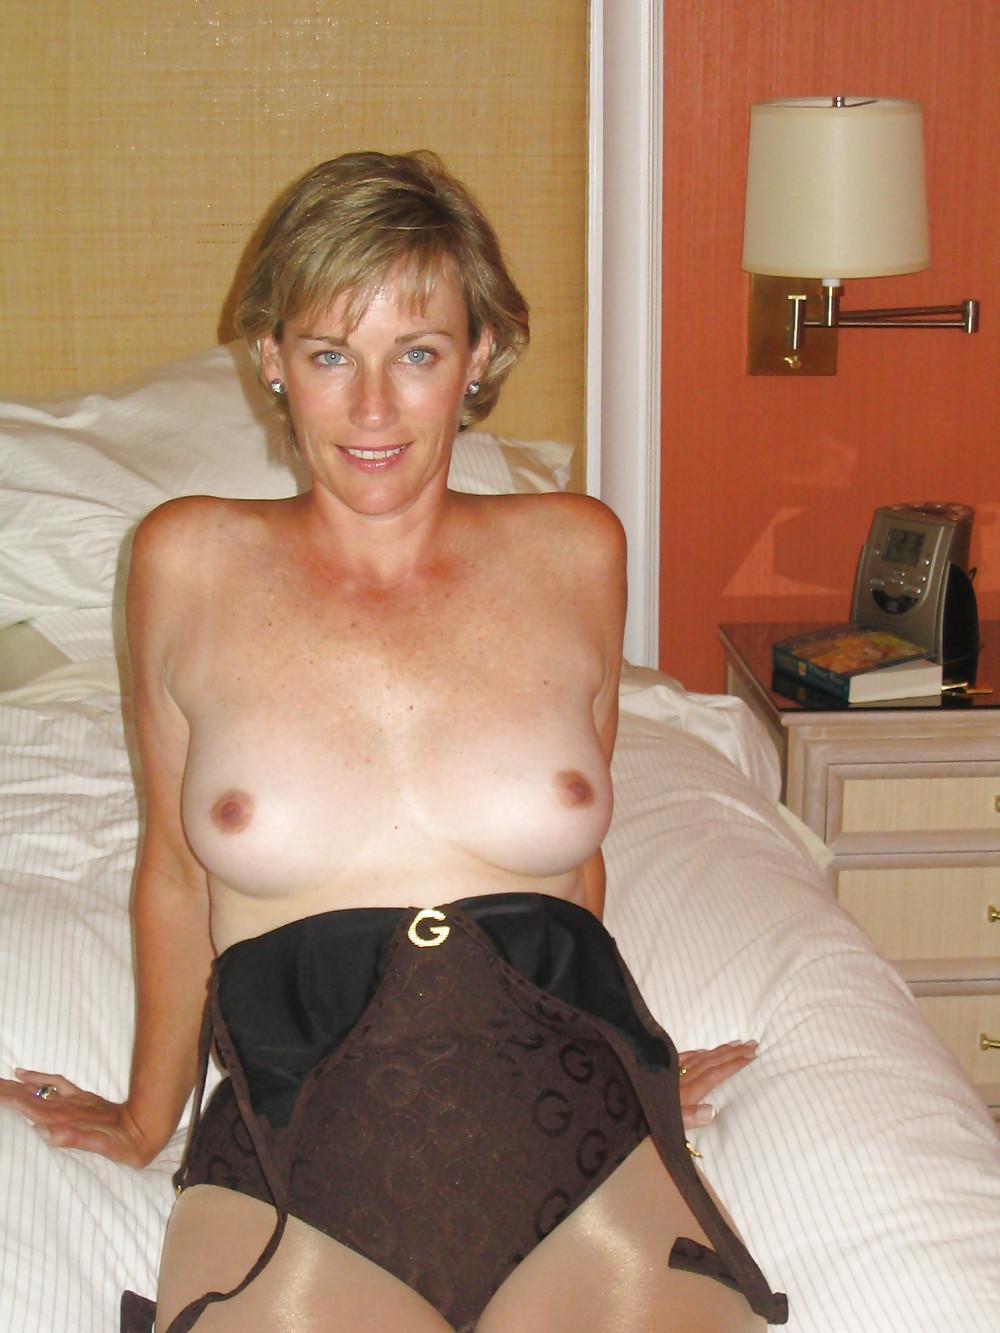 http://hotamateurmature.com/gallery/Housewives_milf_mature_elders/11.jpg